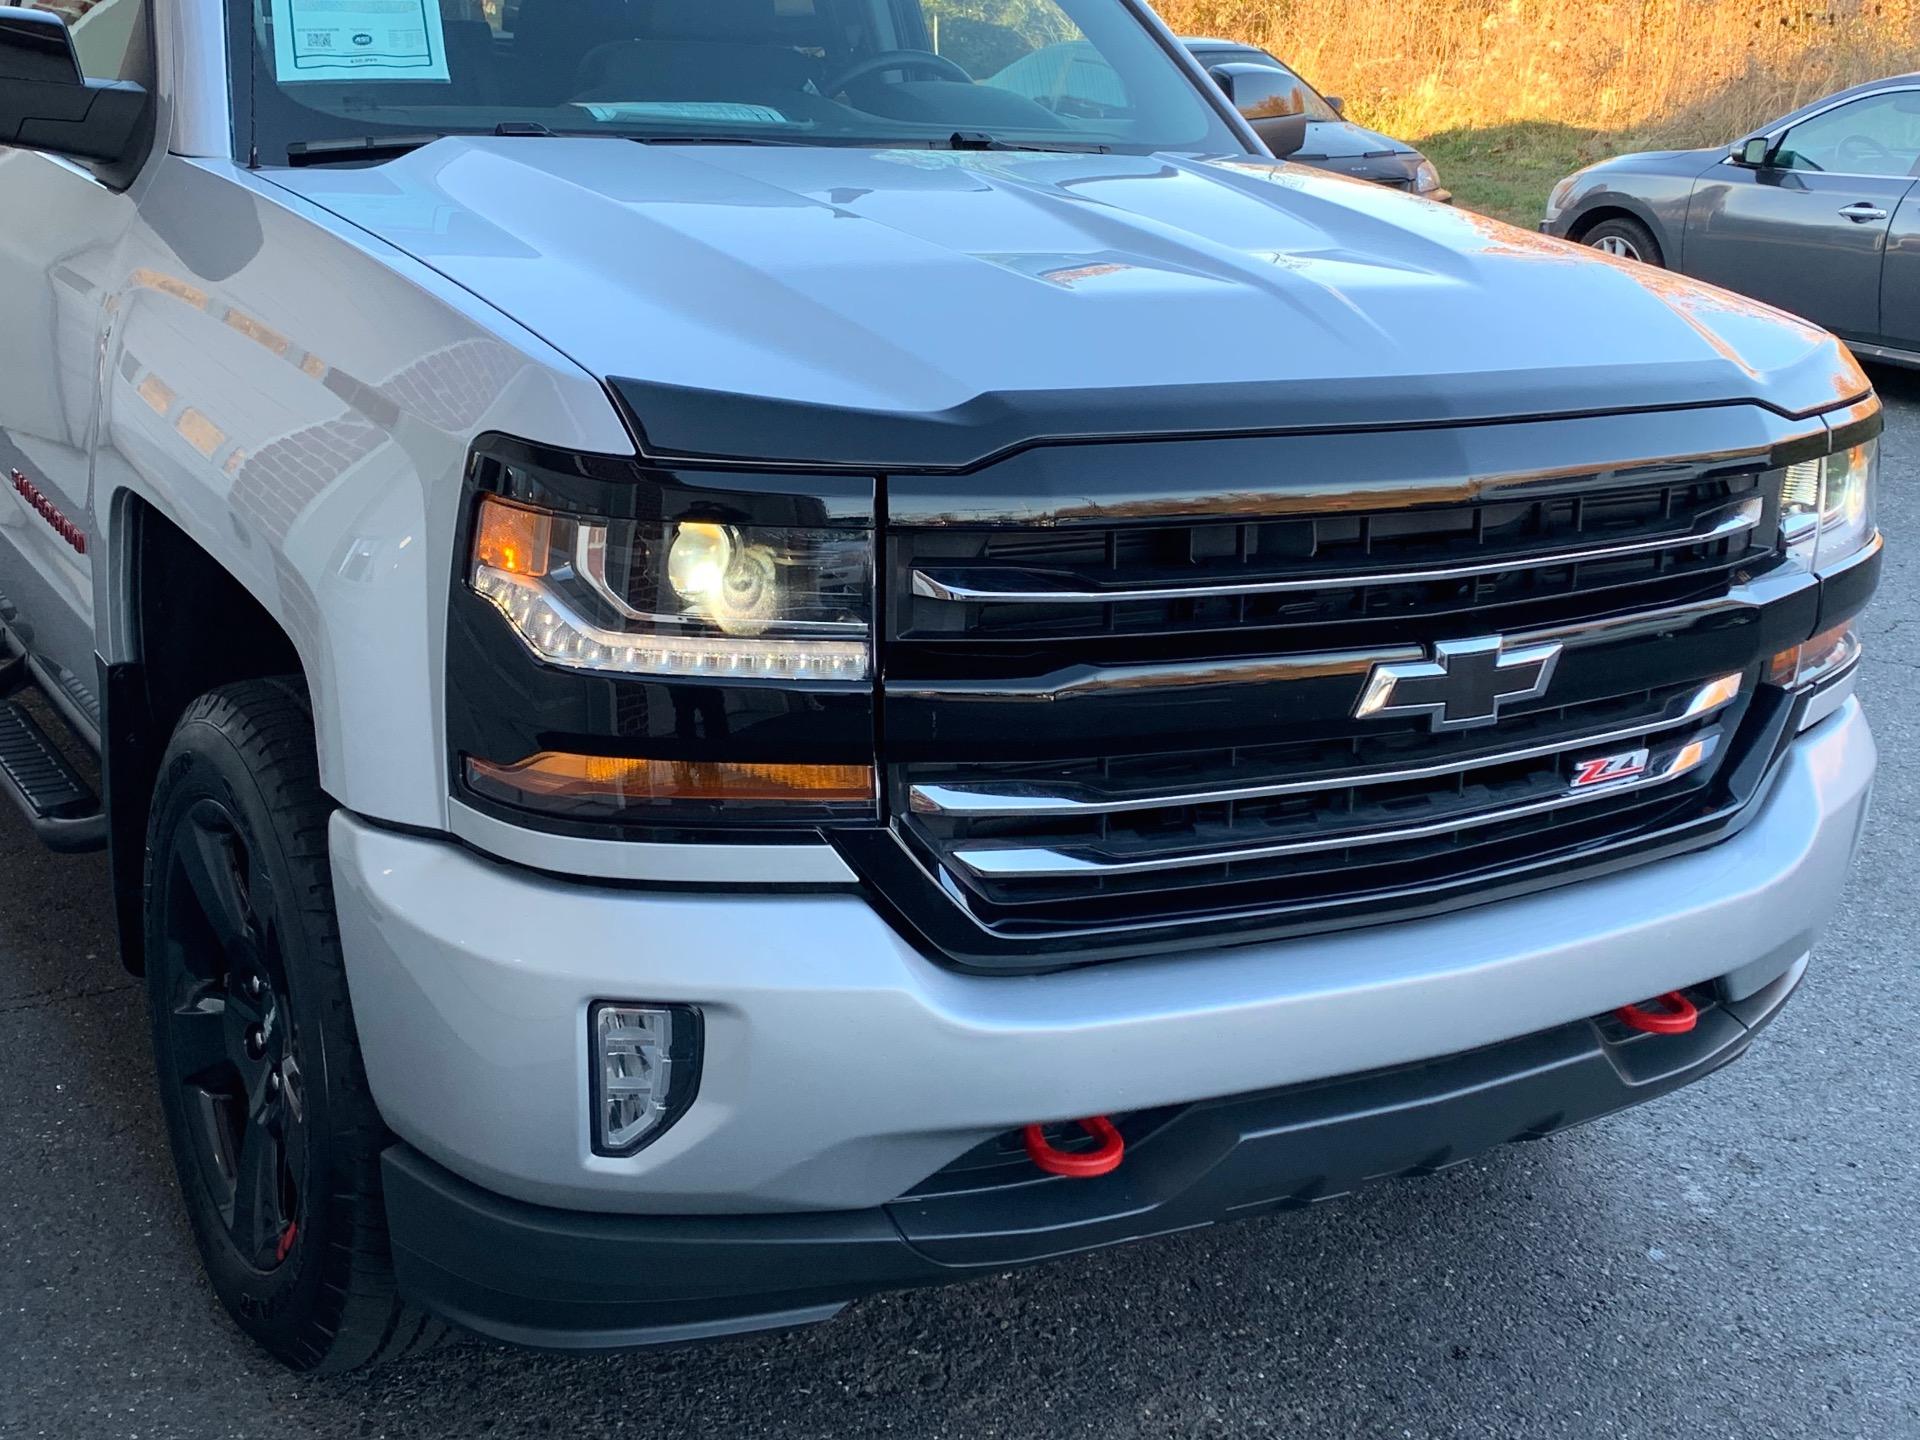 Used-2017-Chevrolet-Silverado-1500-LT-Z71-RedLine-Edition